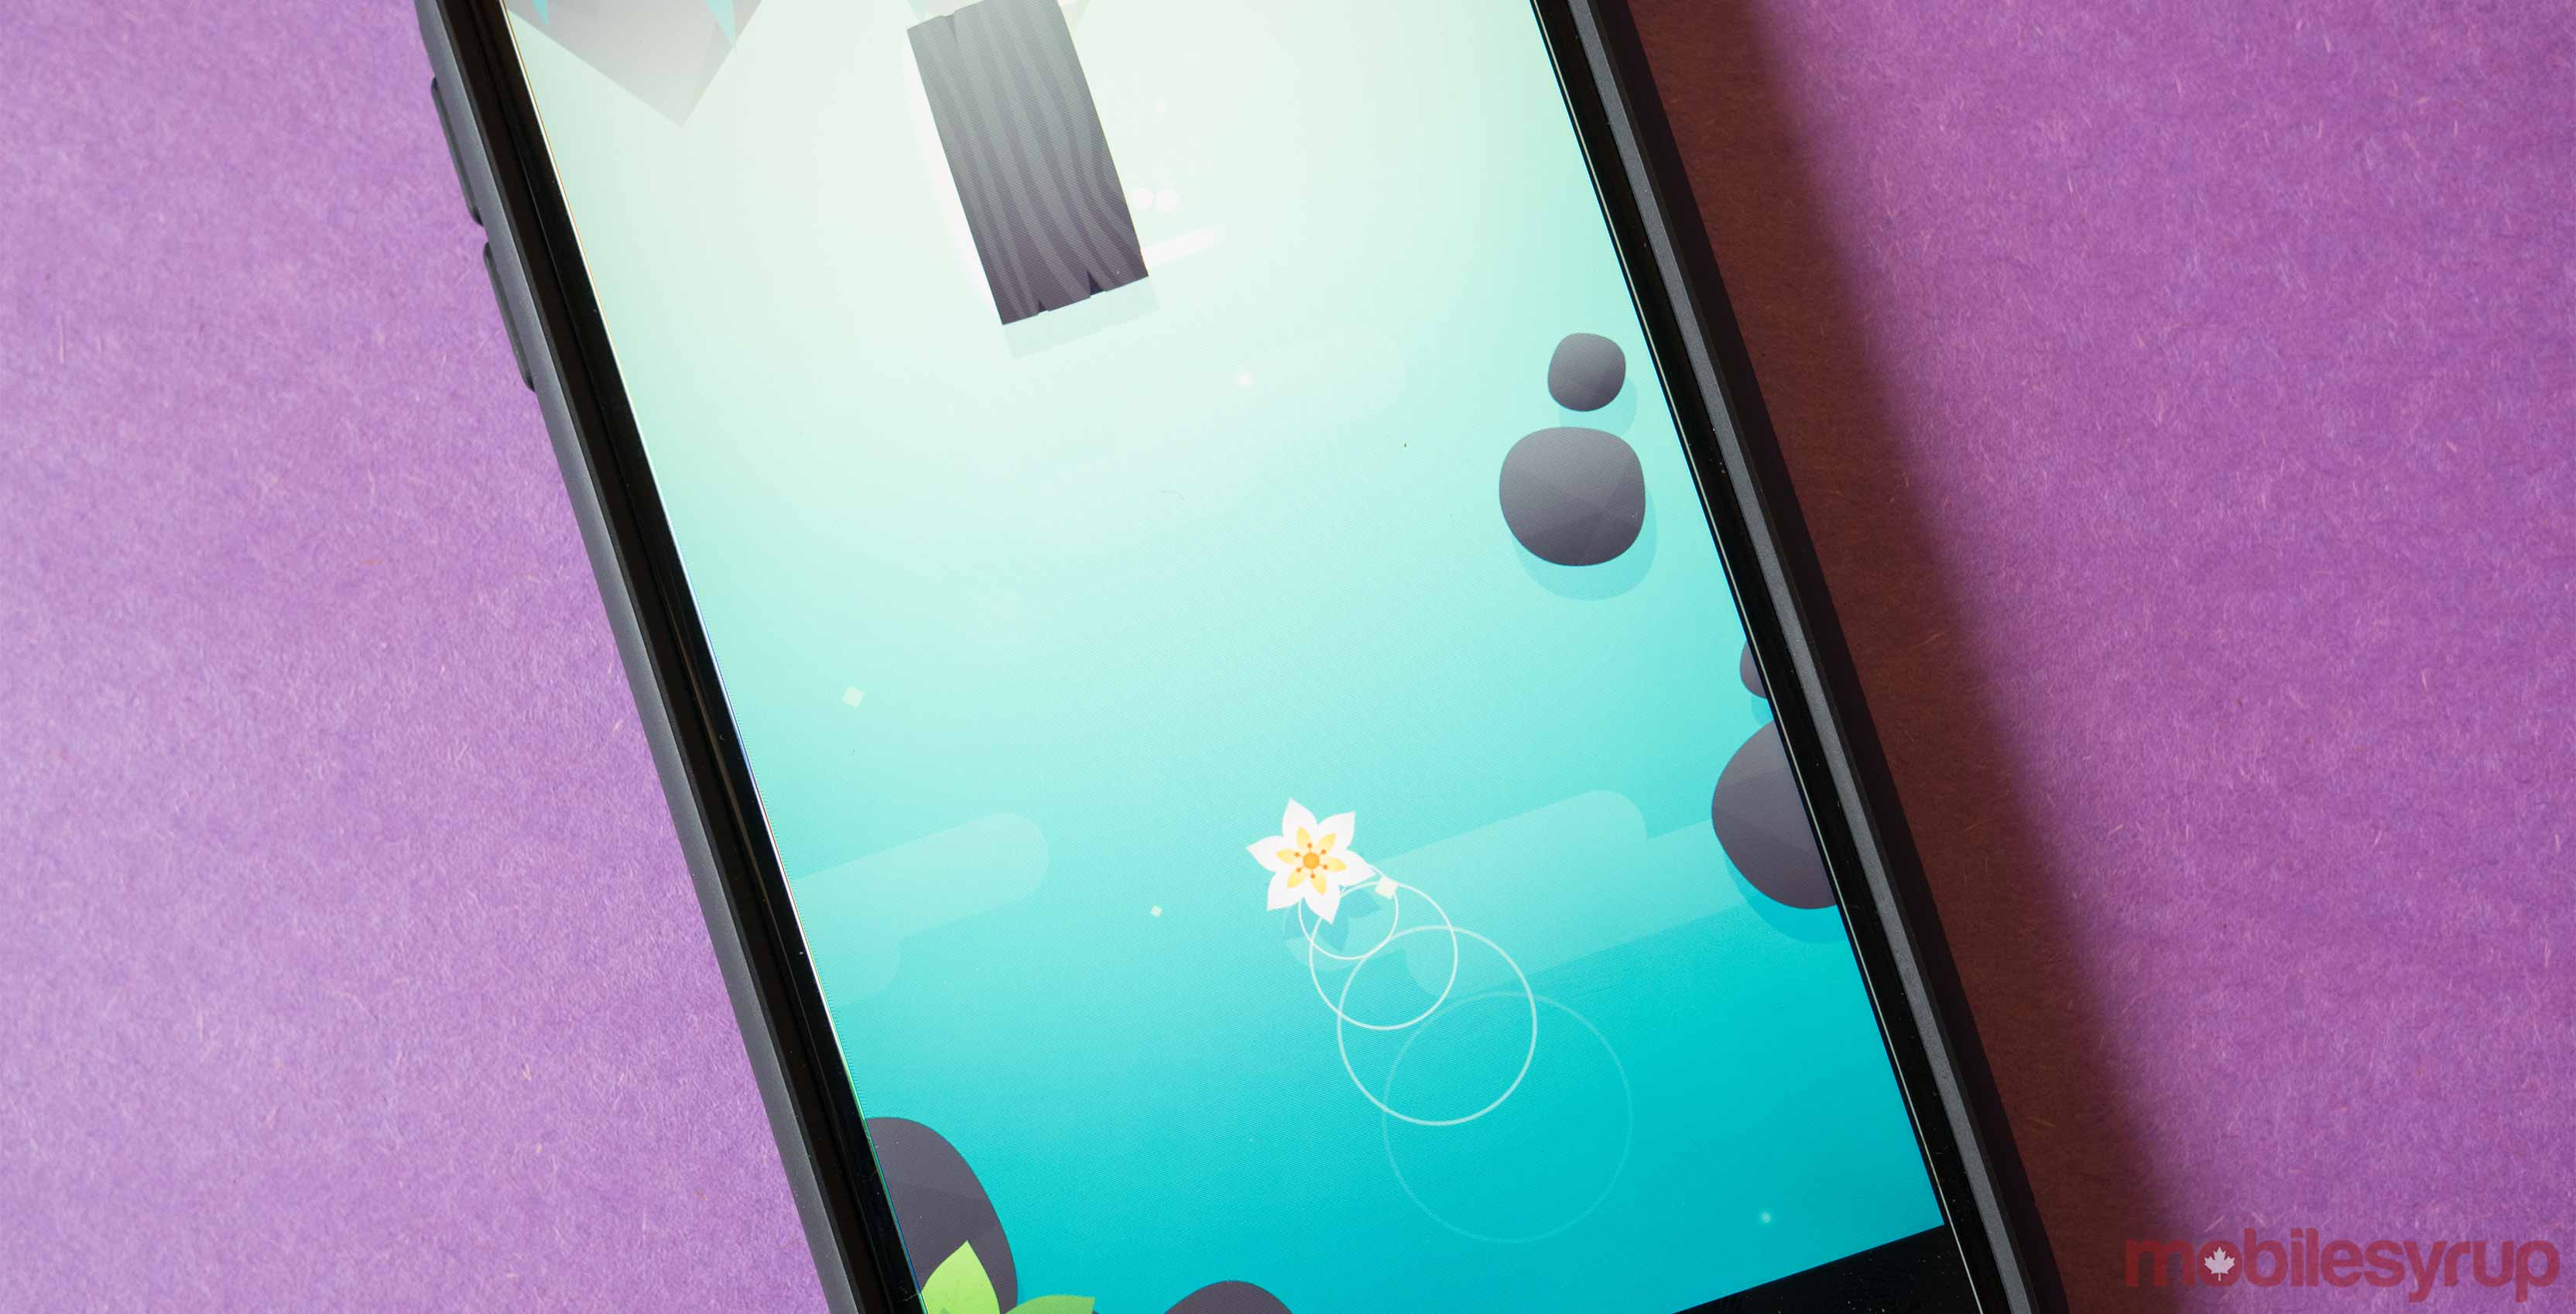 Float iOS smartphone game